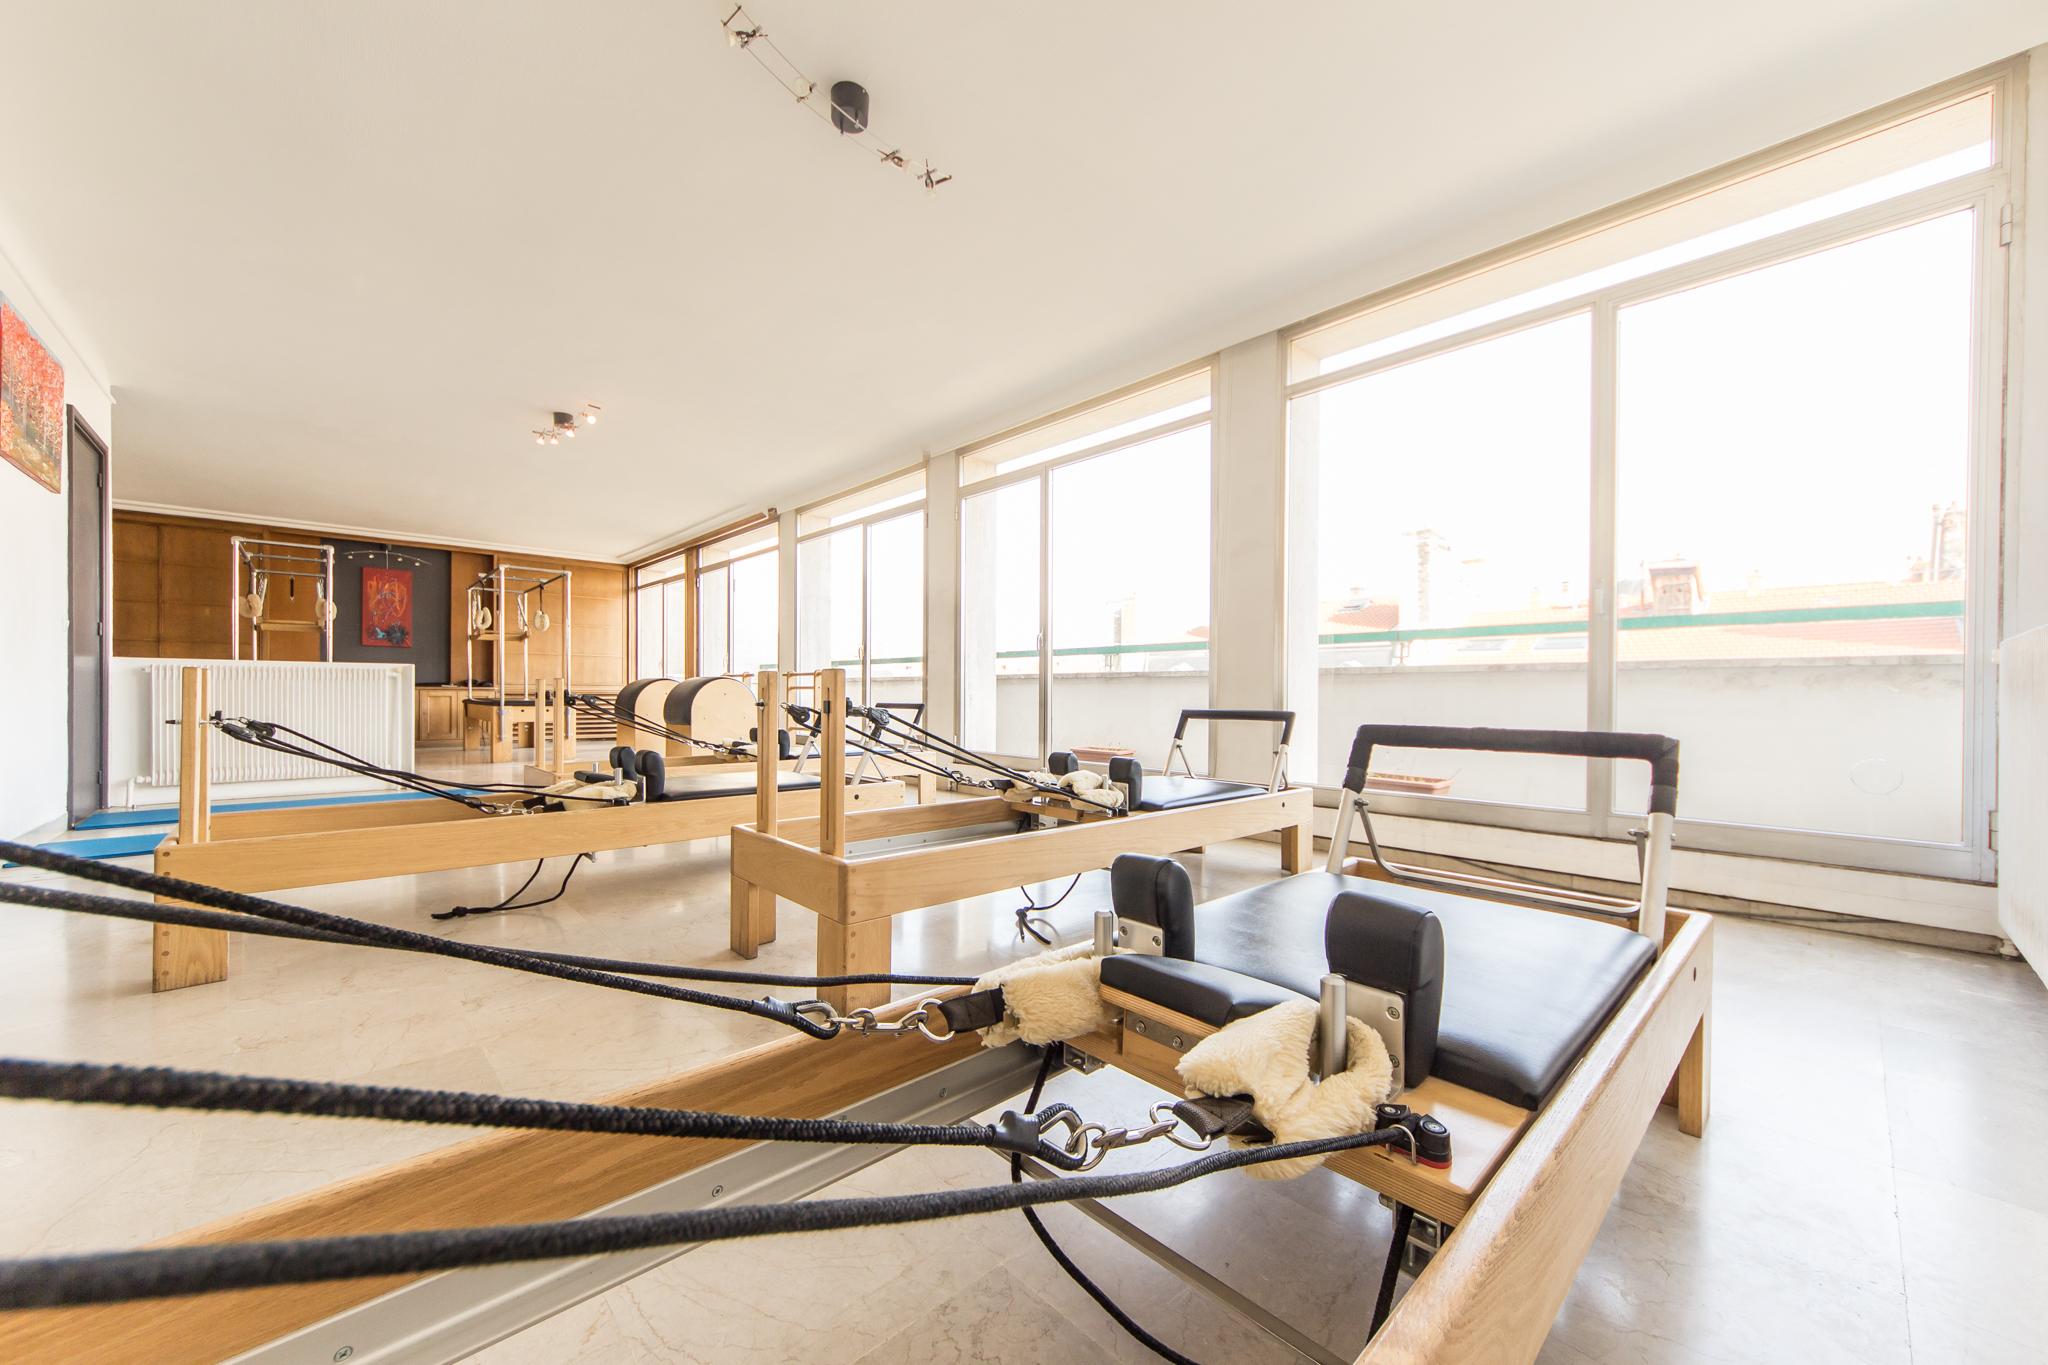 Salle de Pilates 1